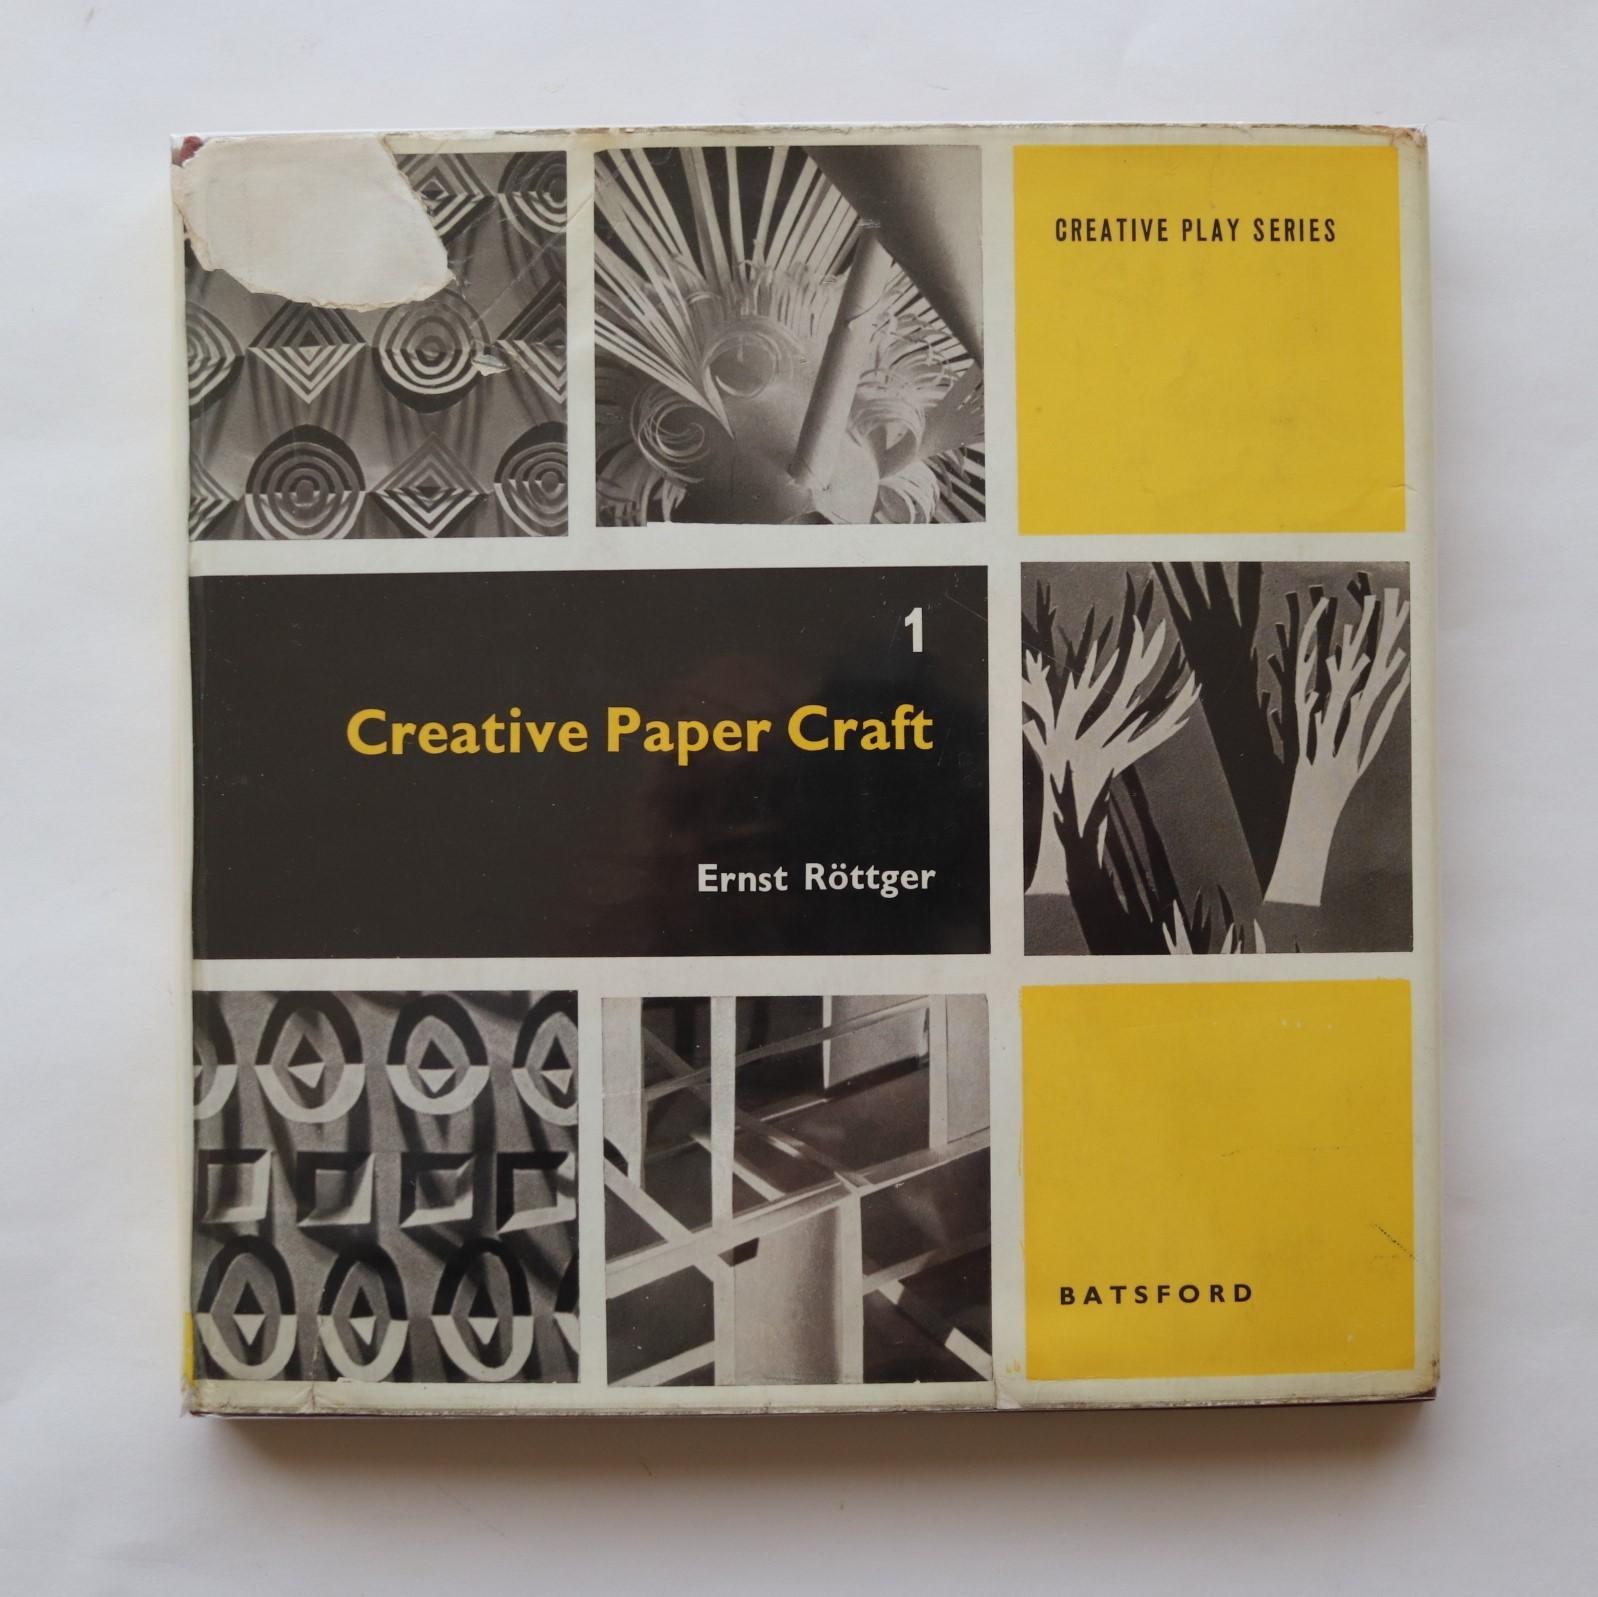 Creative Paper Craft 1 / エルンスト・ロテガー Ernst Rottger